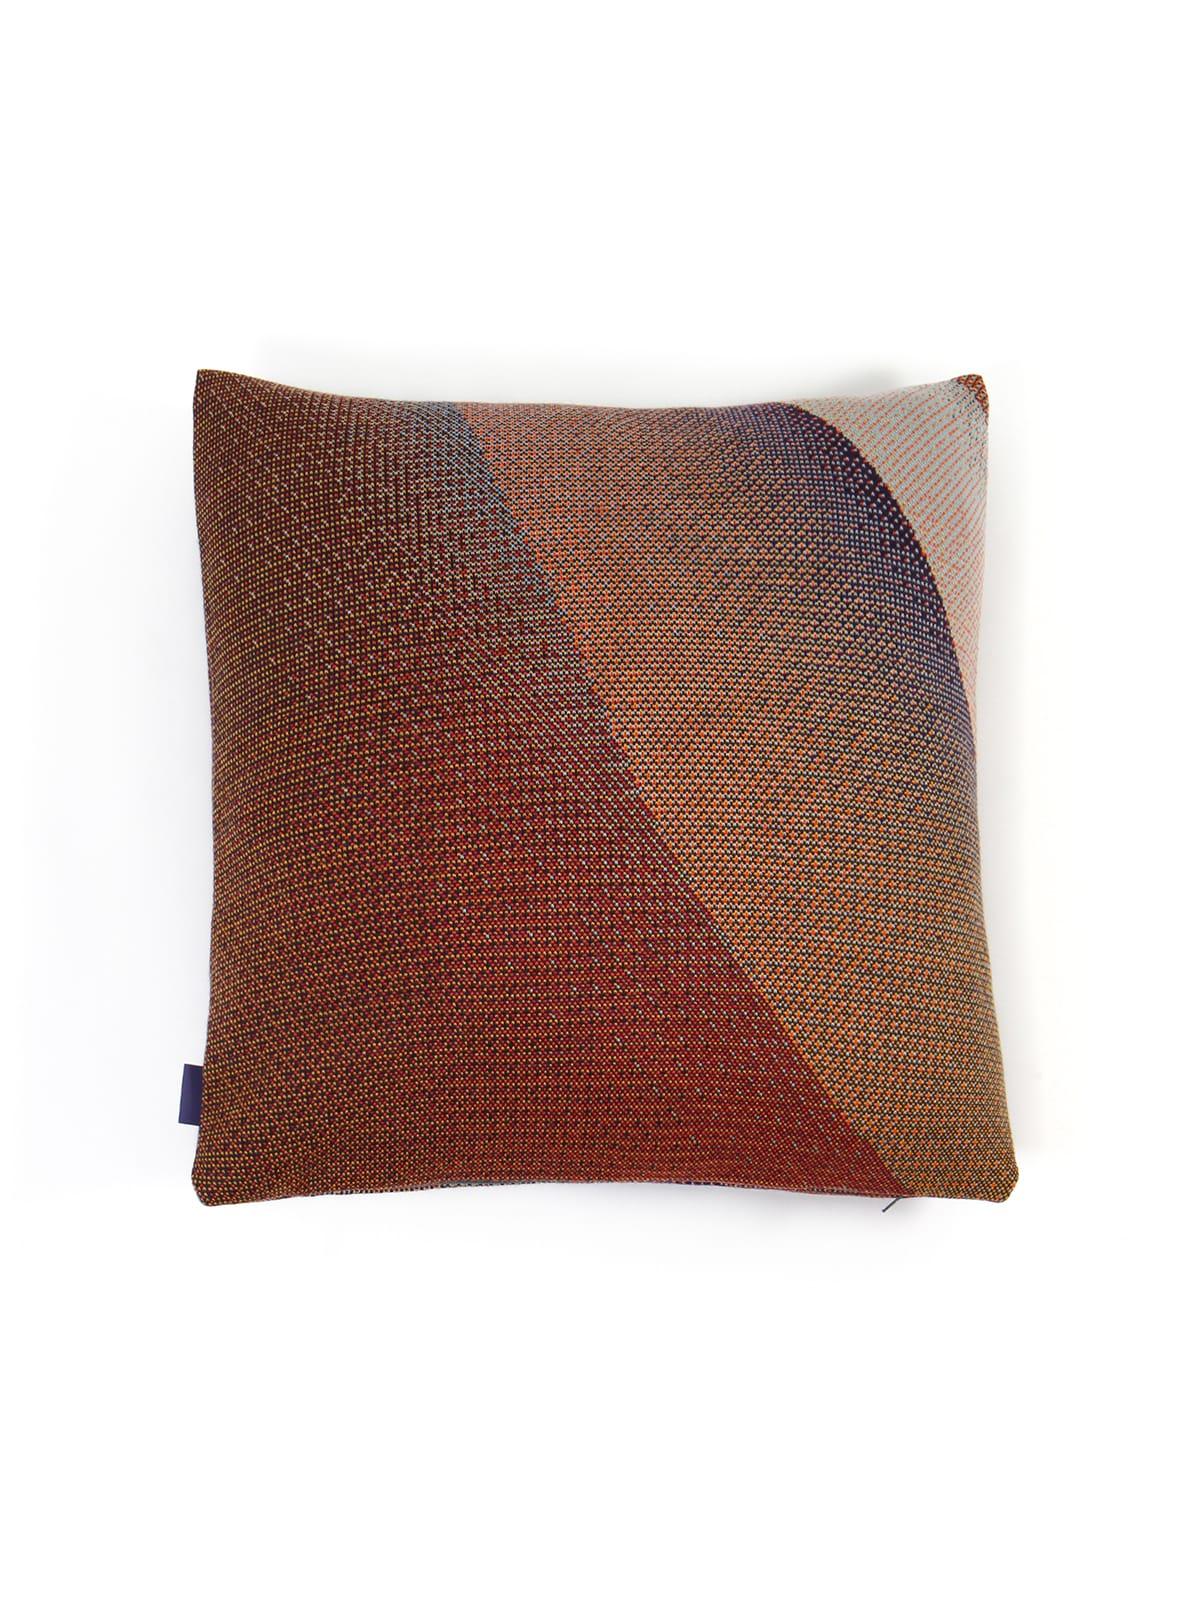 Knitted Cushion 50x50 Musselshell No1 - Merino Wool hinten